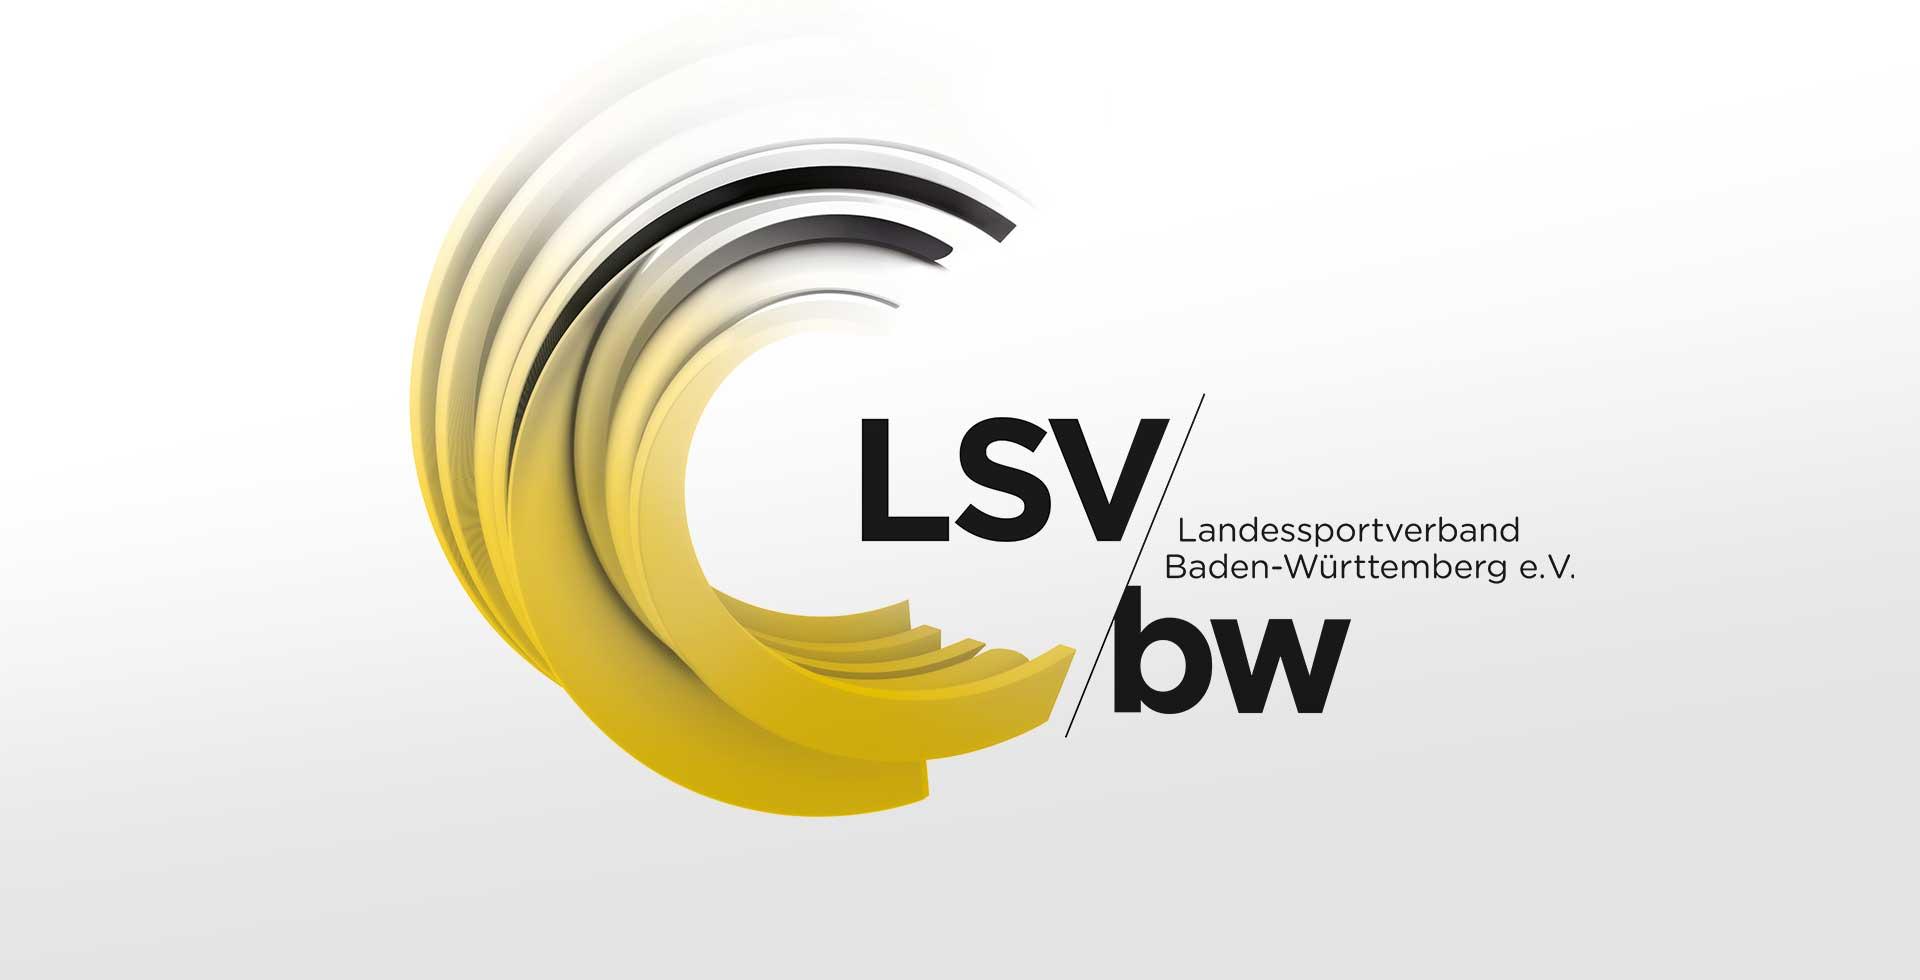 lsv_01